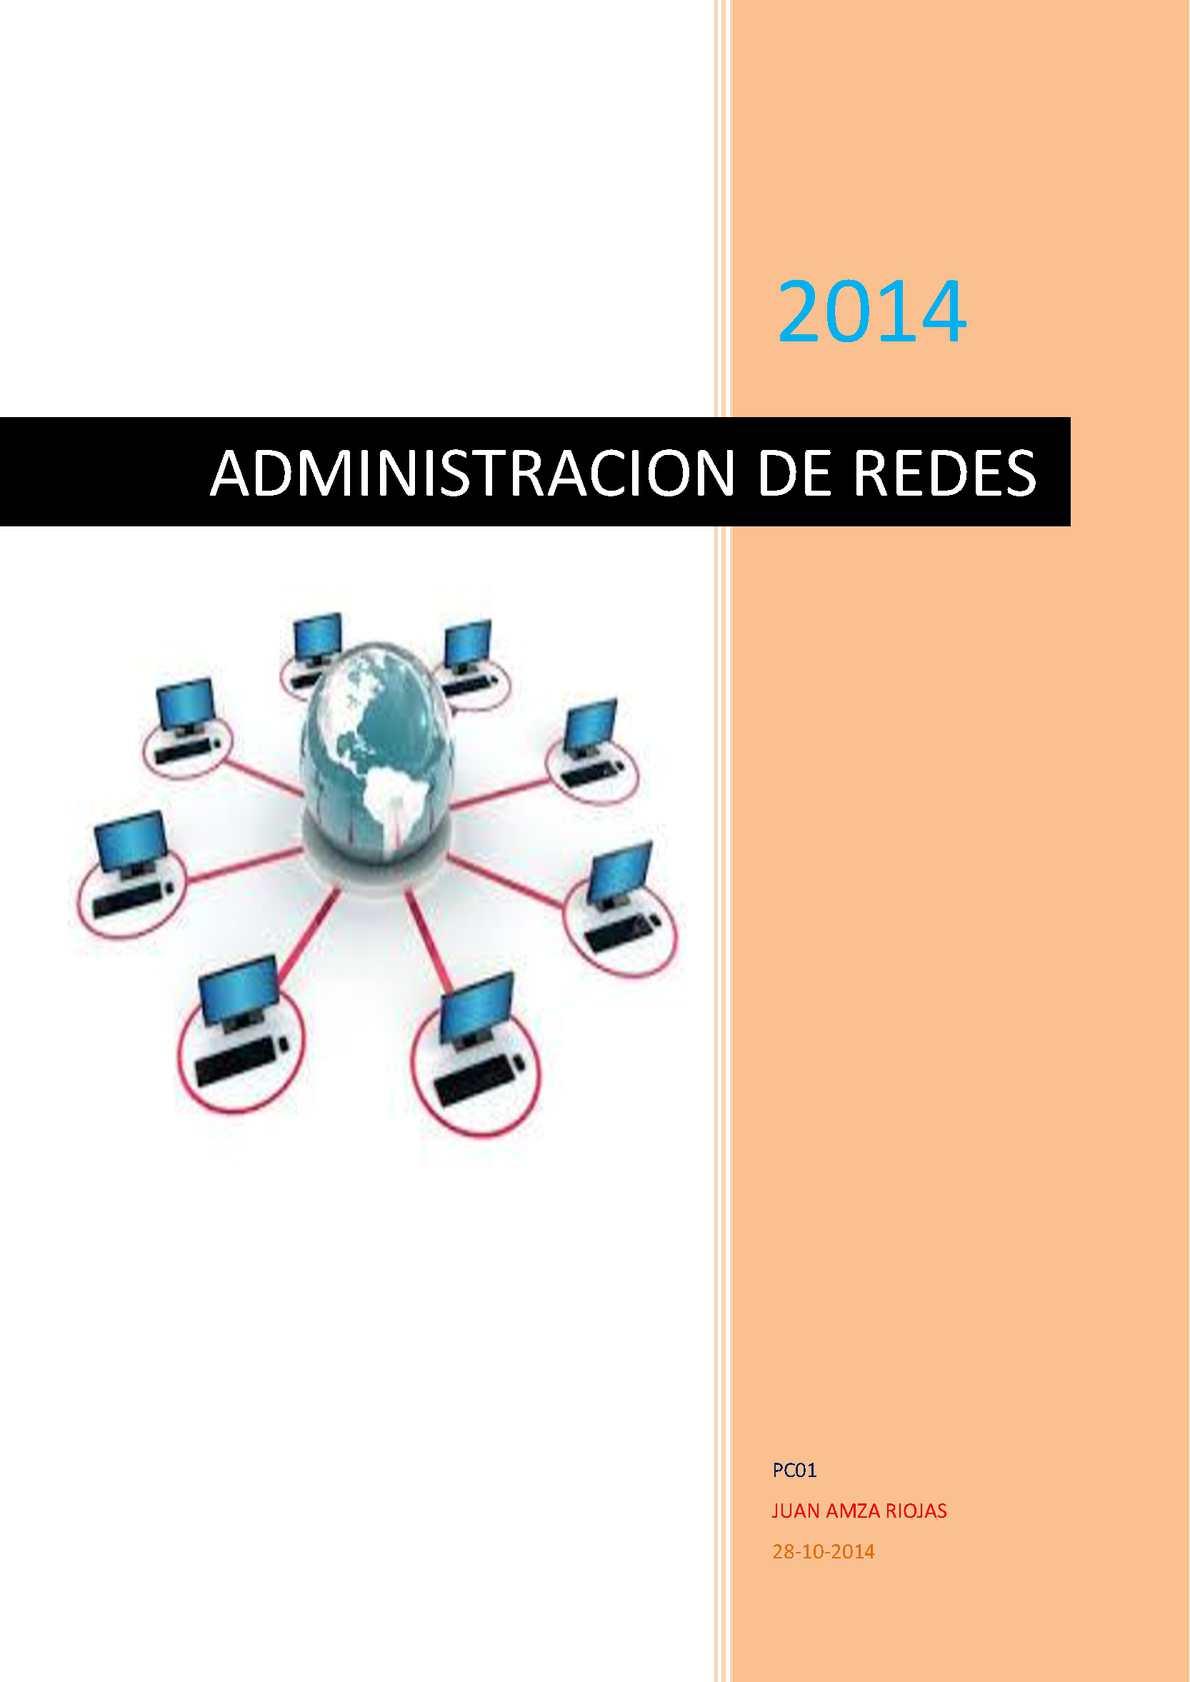 Calaméo - Glosario De Administración De Redes